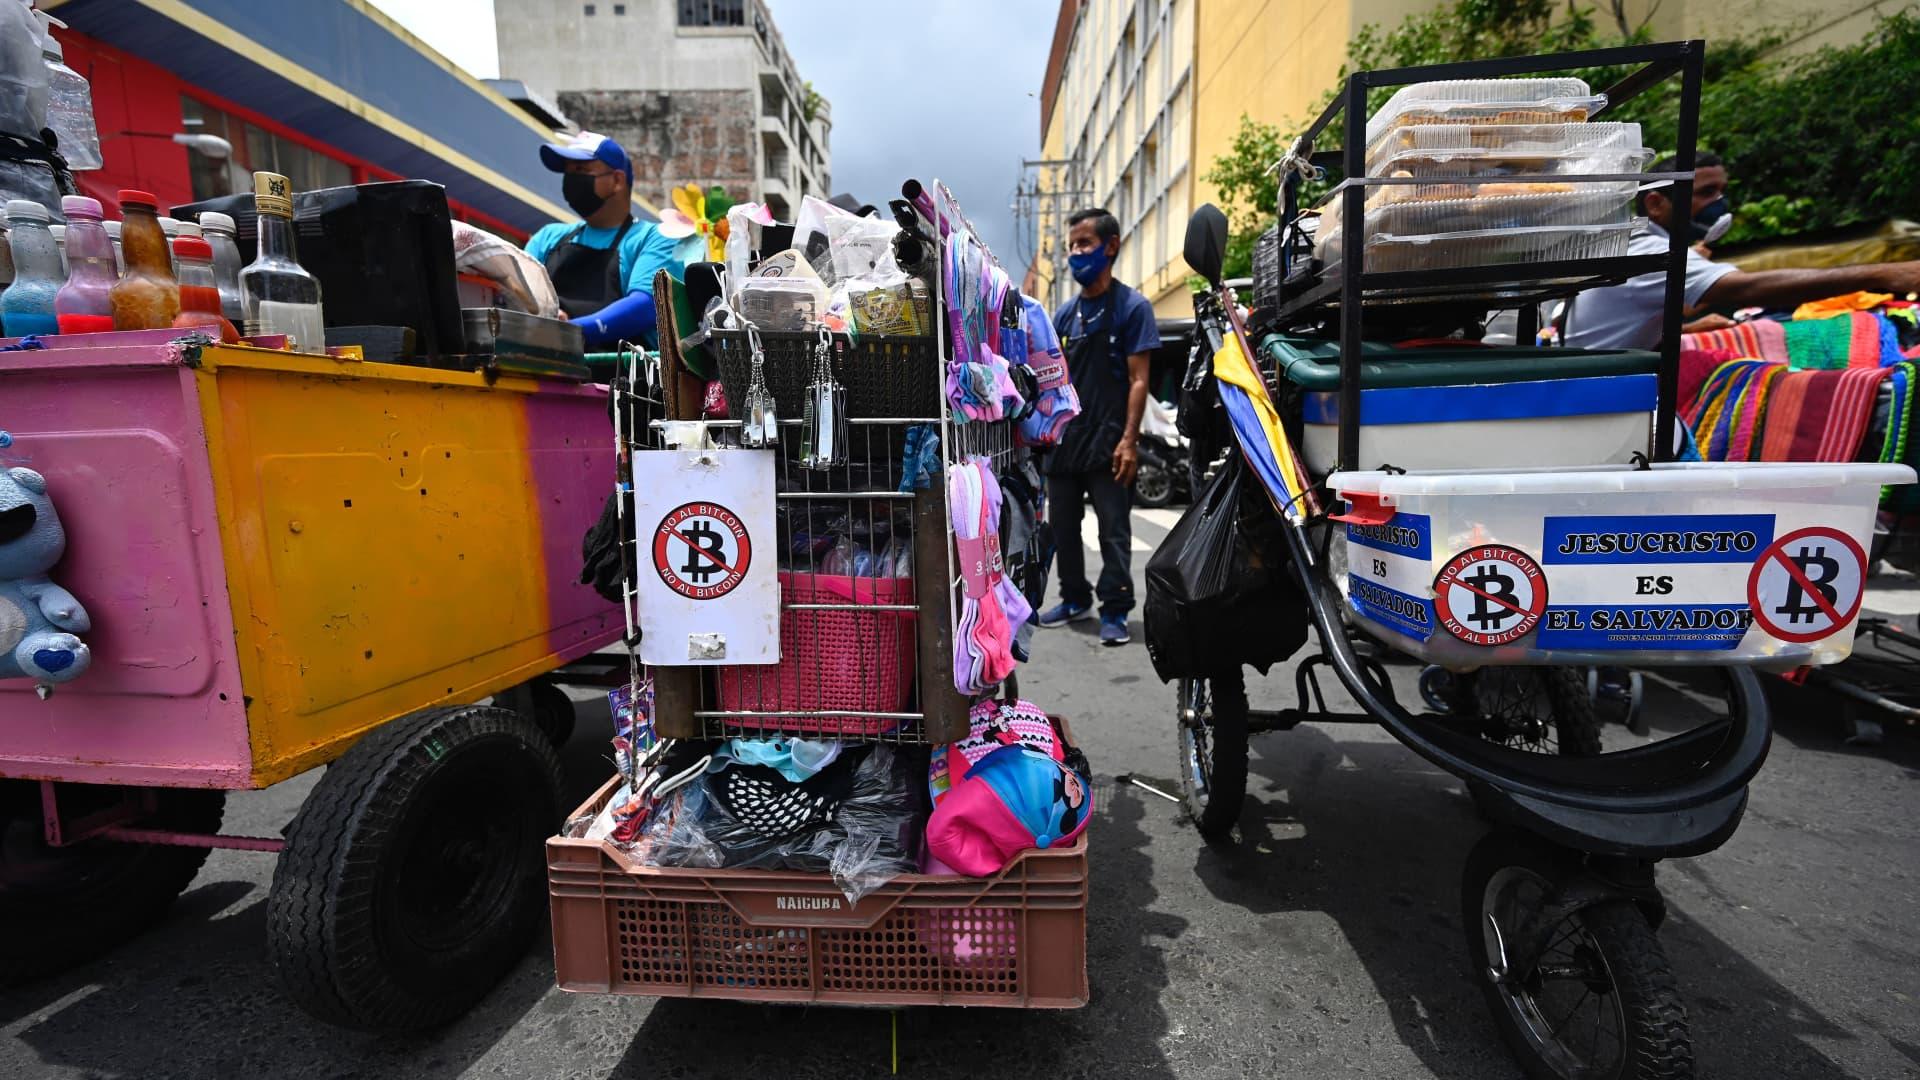 Street vendors in San Salvador with anti-bitcoin stickers.